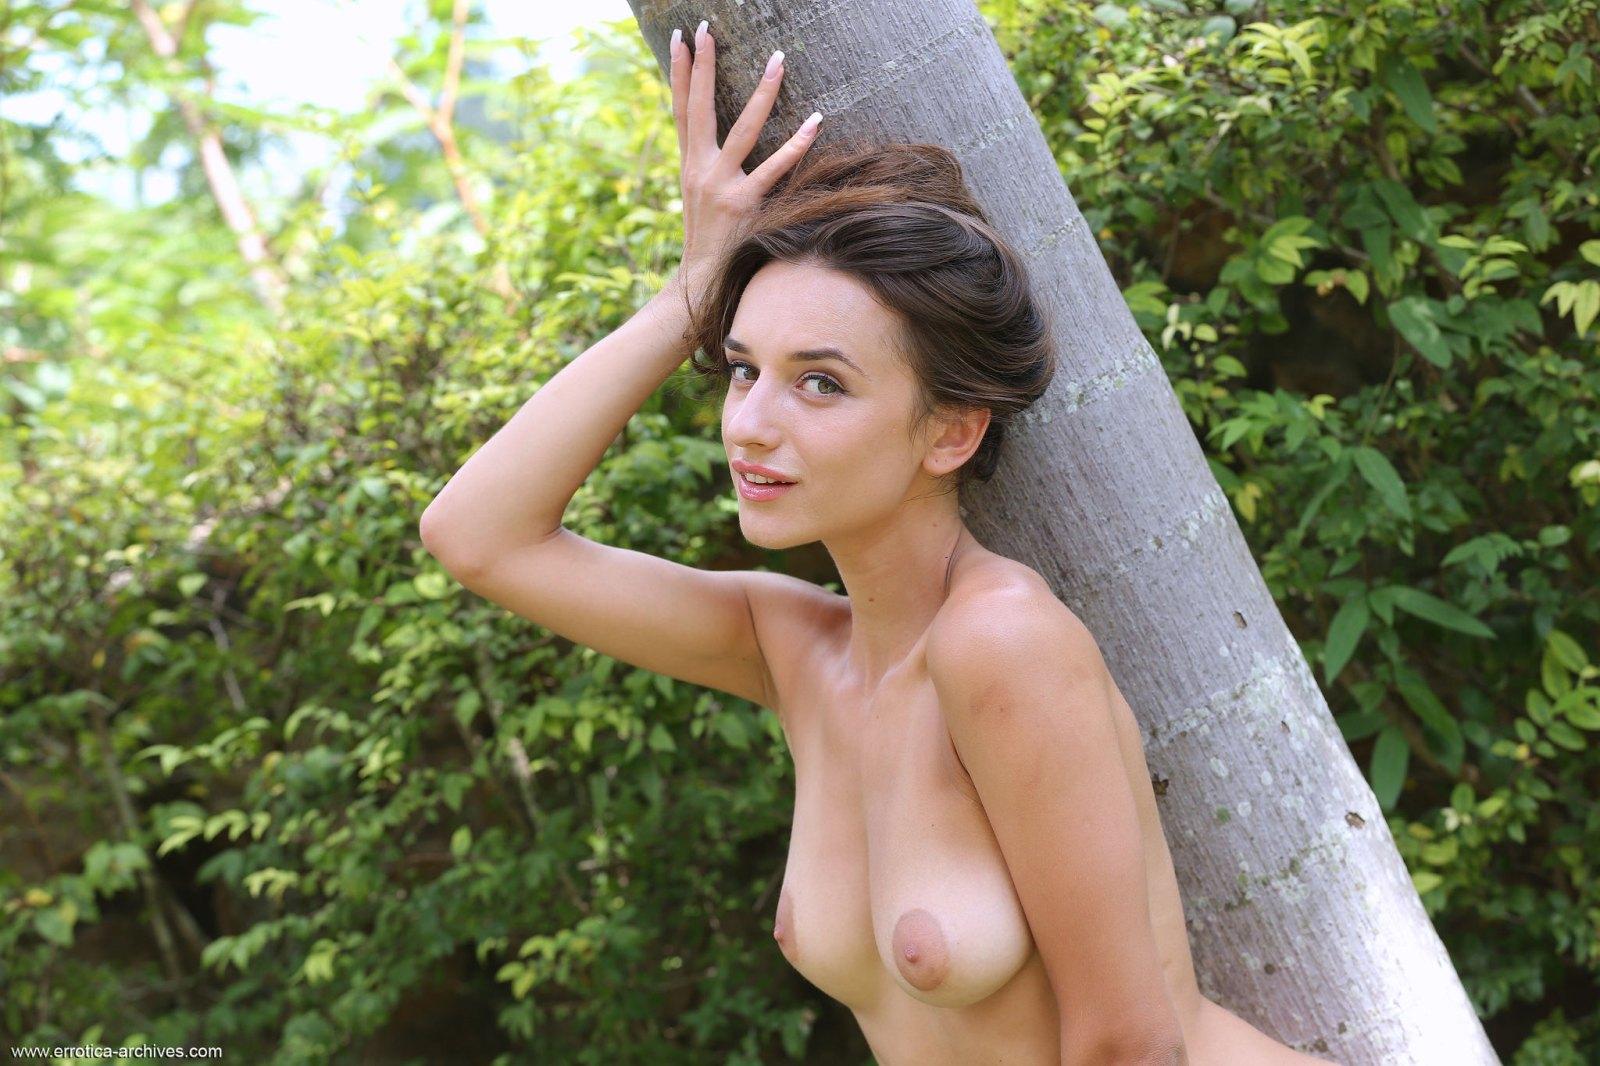 gloria-sol-naked-girl-minigolf-boobs-errotica-archives-36